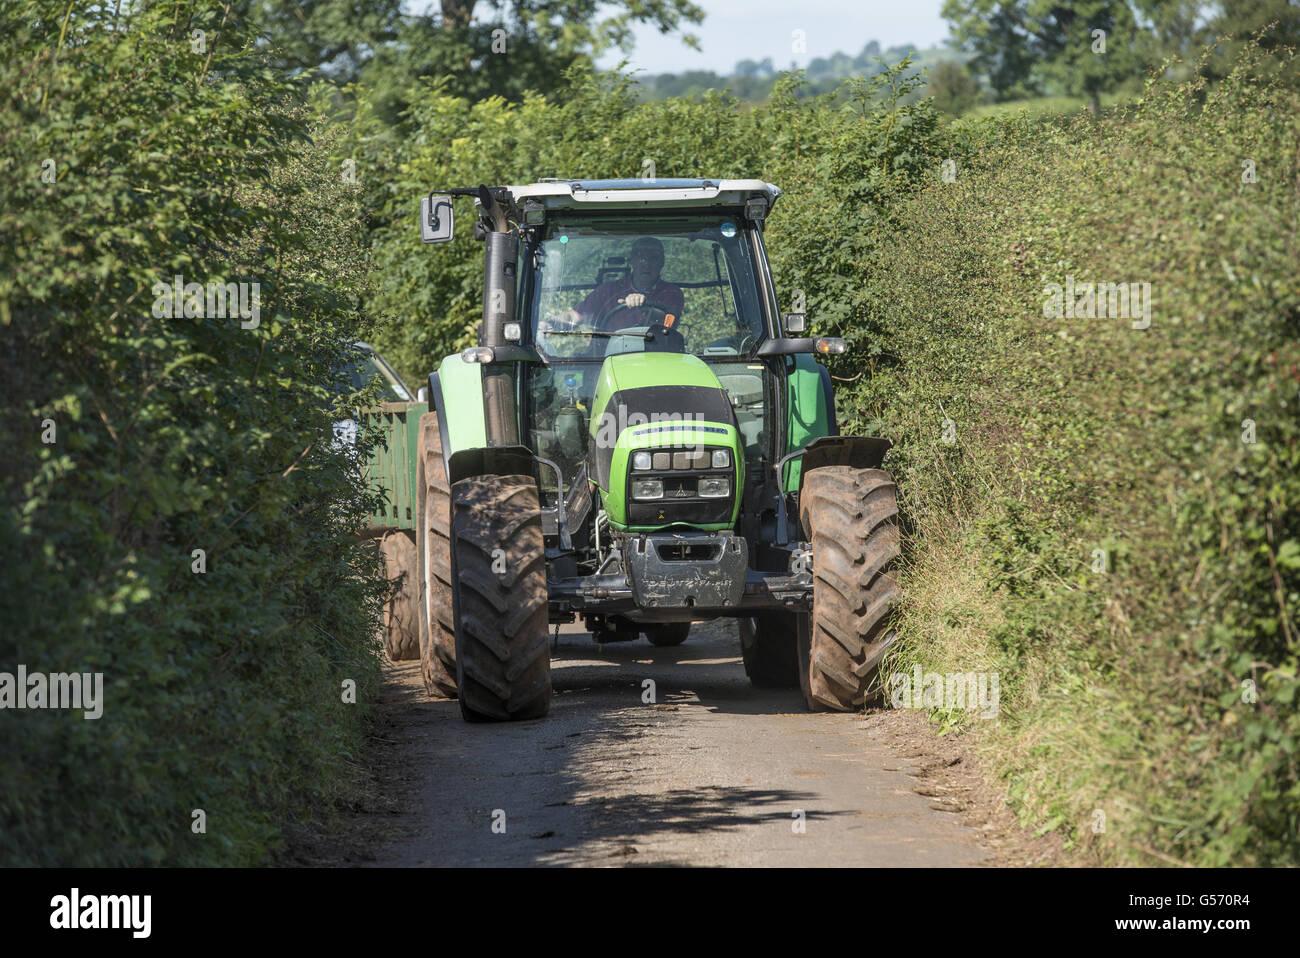 Deutz Fahr tractor driving along narrow country lane, Cumbria, England, September Stock Photo